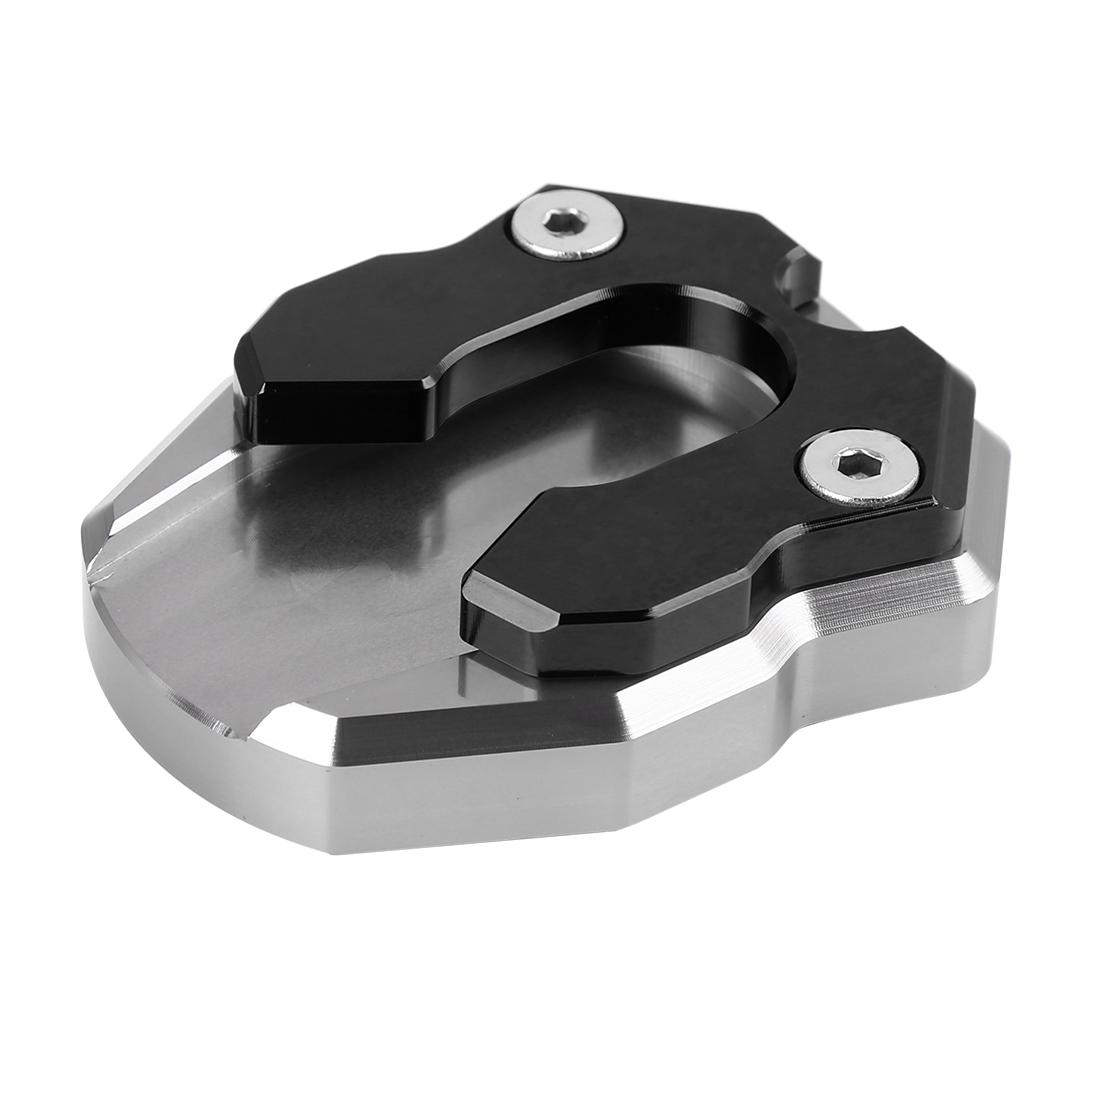 Titanium Tone Black Motorcycle Kickstand Pad Extension Plate for YAMAHA NMAX